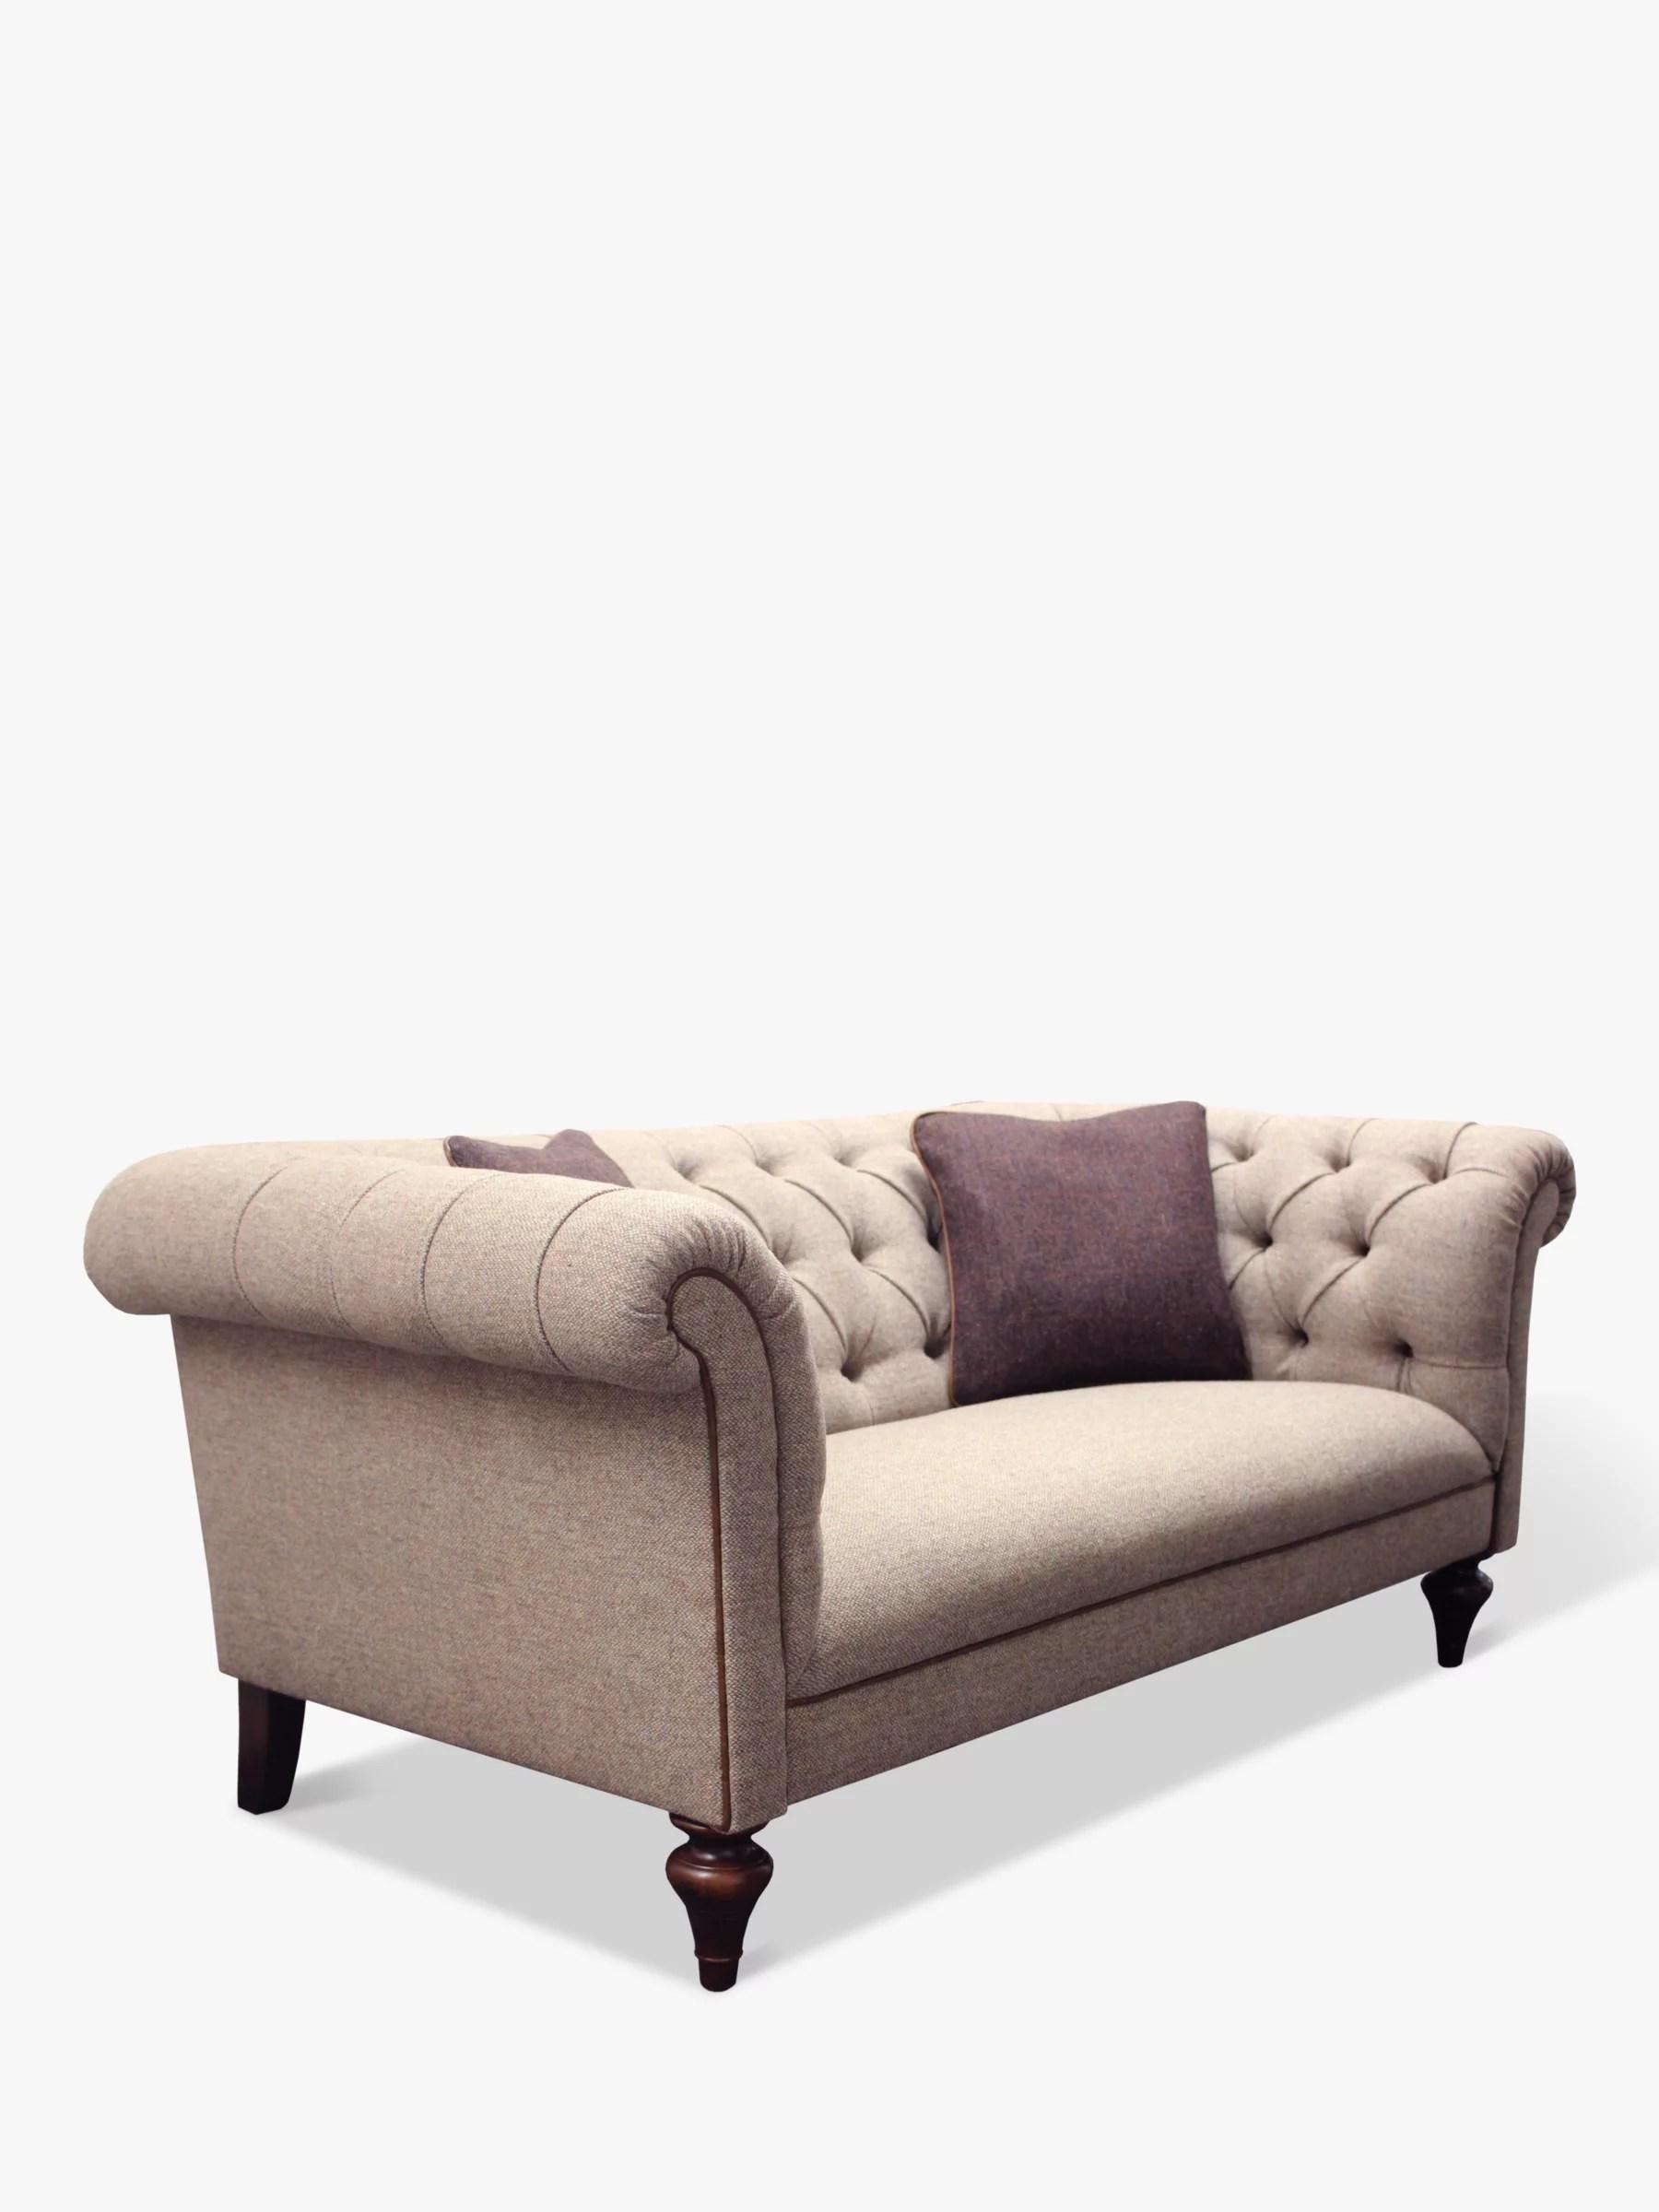 harris tweed bowmore midi sofa kilim covered sofas uk tetrad ireland functionalities thesofa